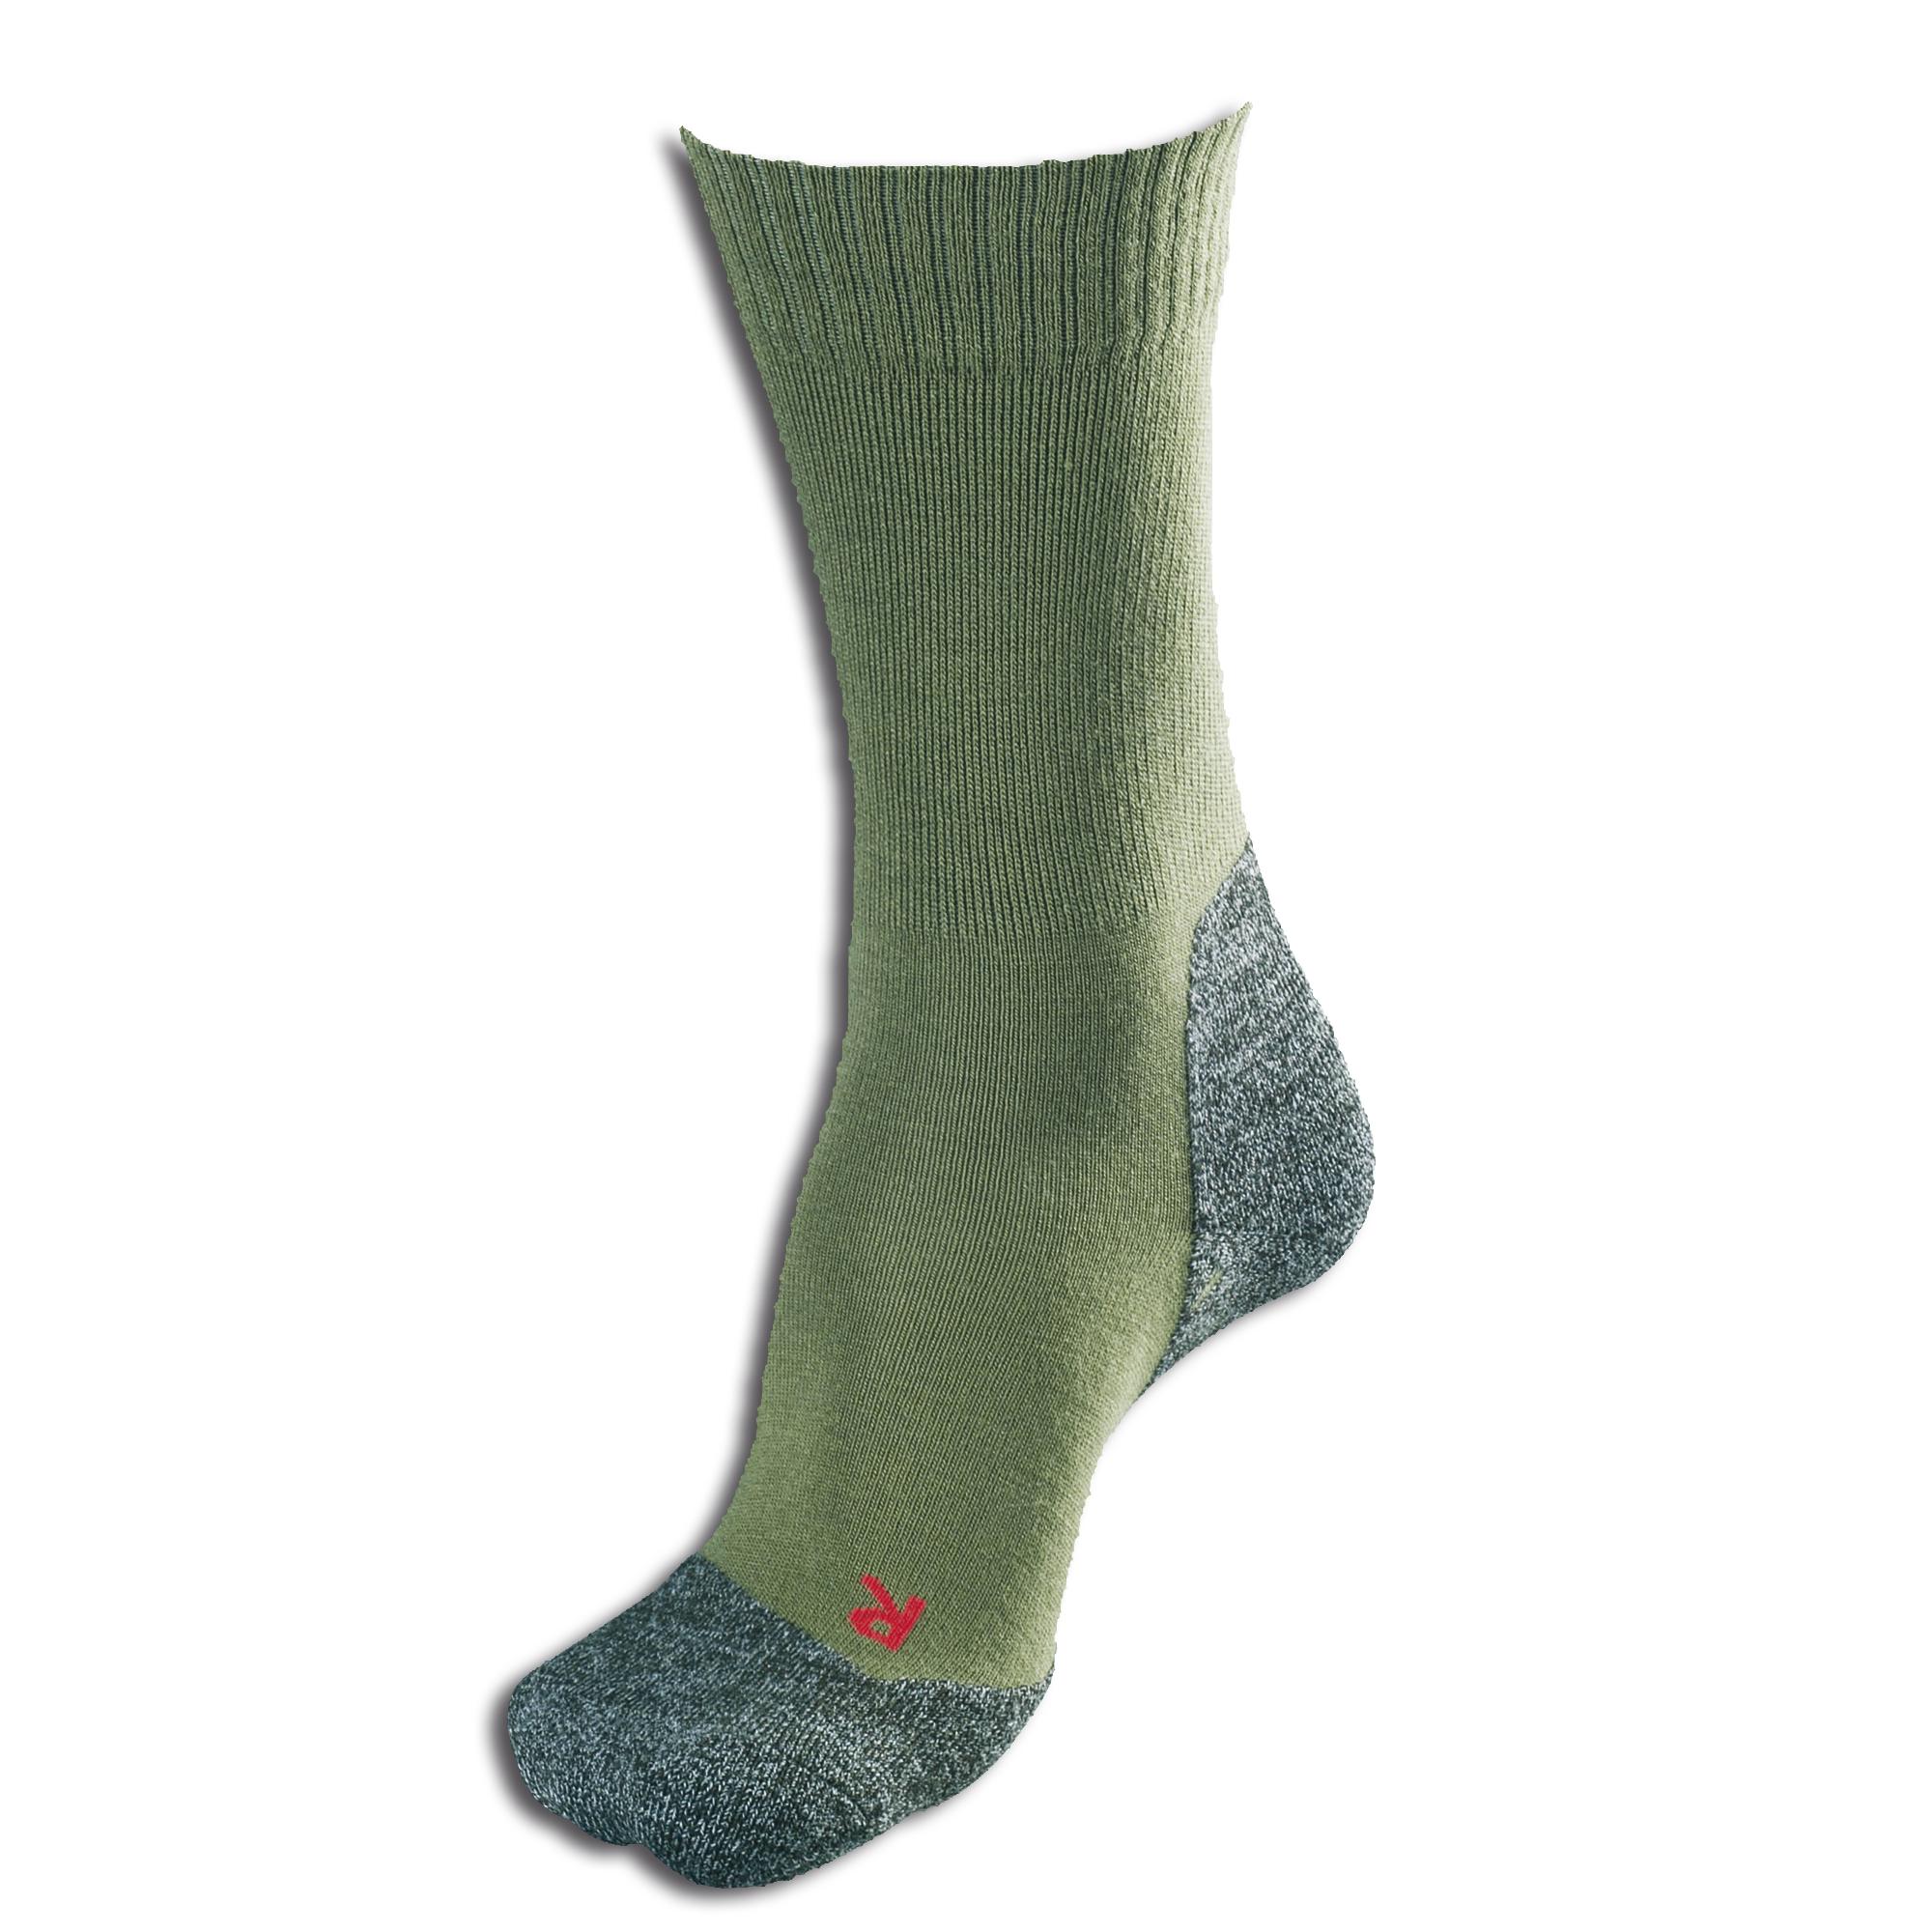 Socken Falke TK2 oliv